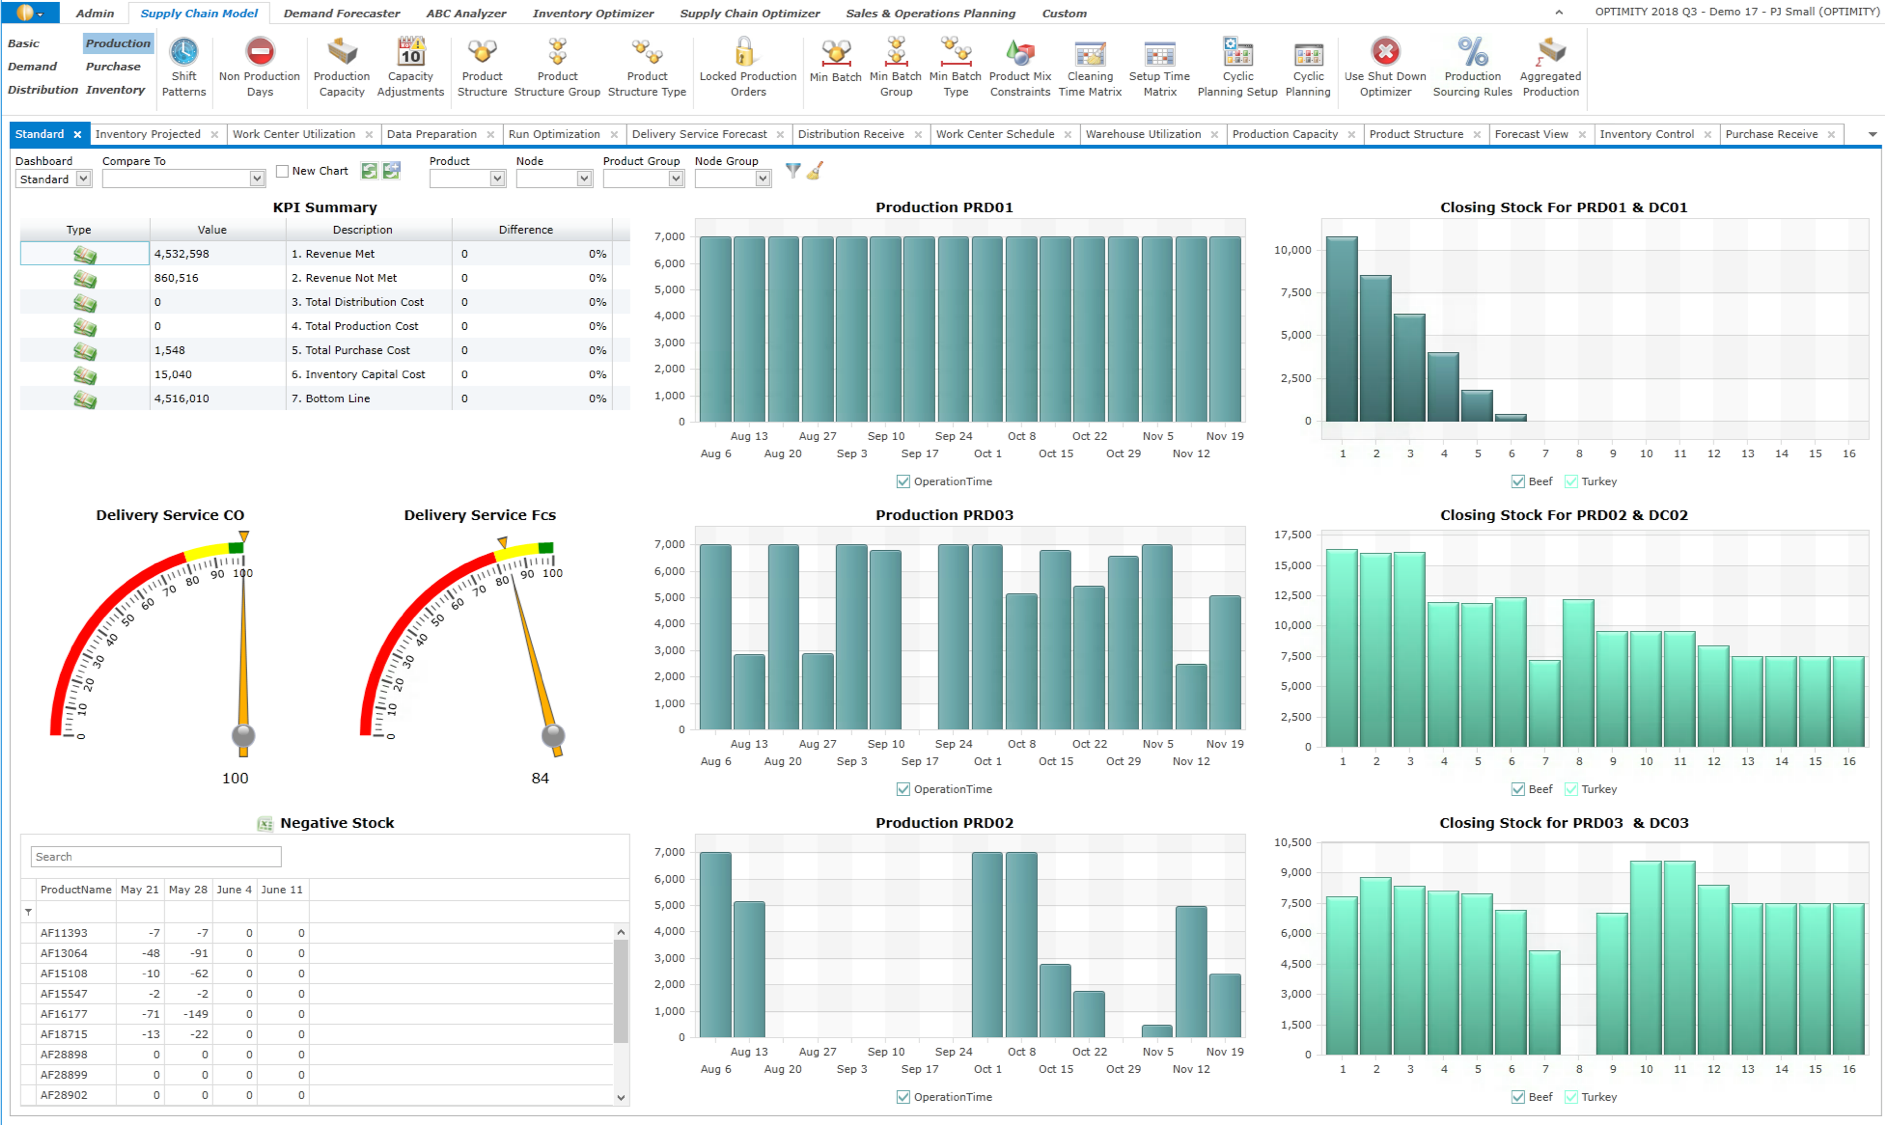 Supply Chain Planning Dashboard